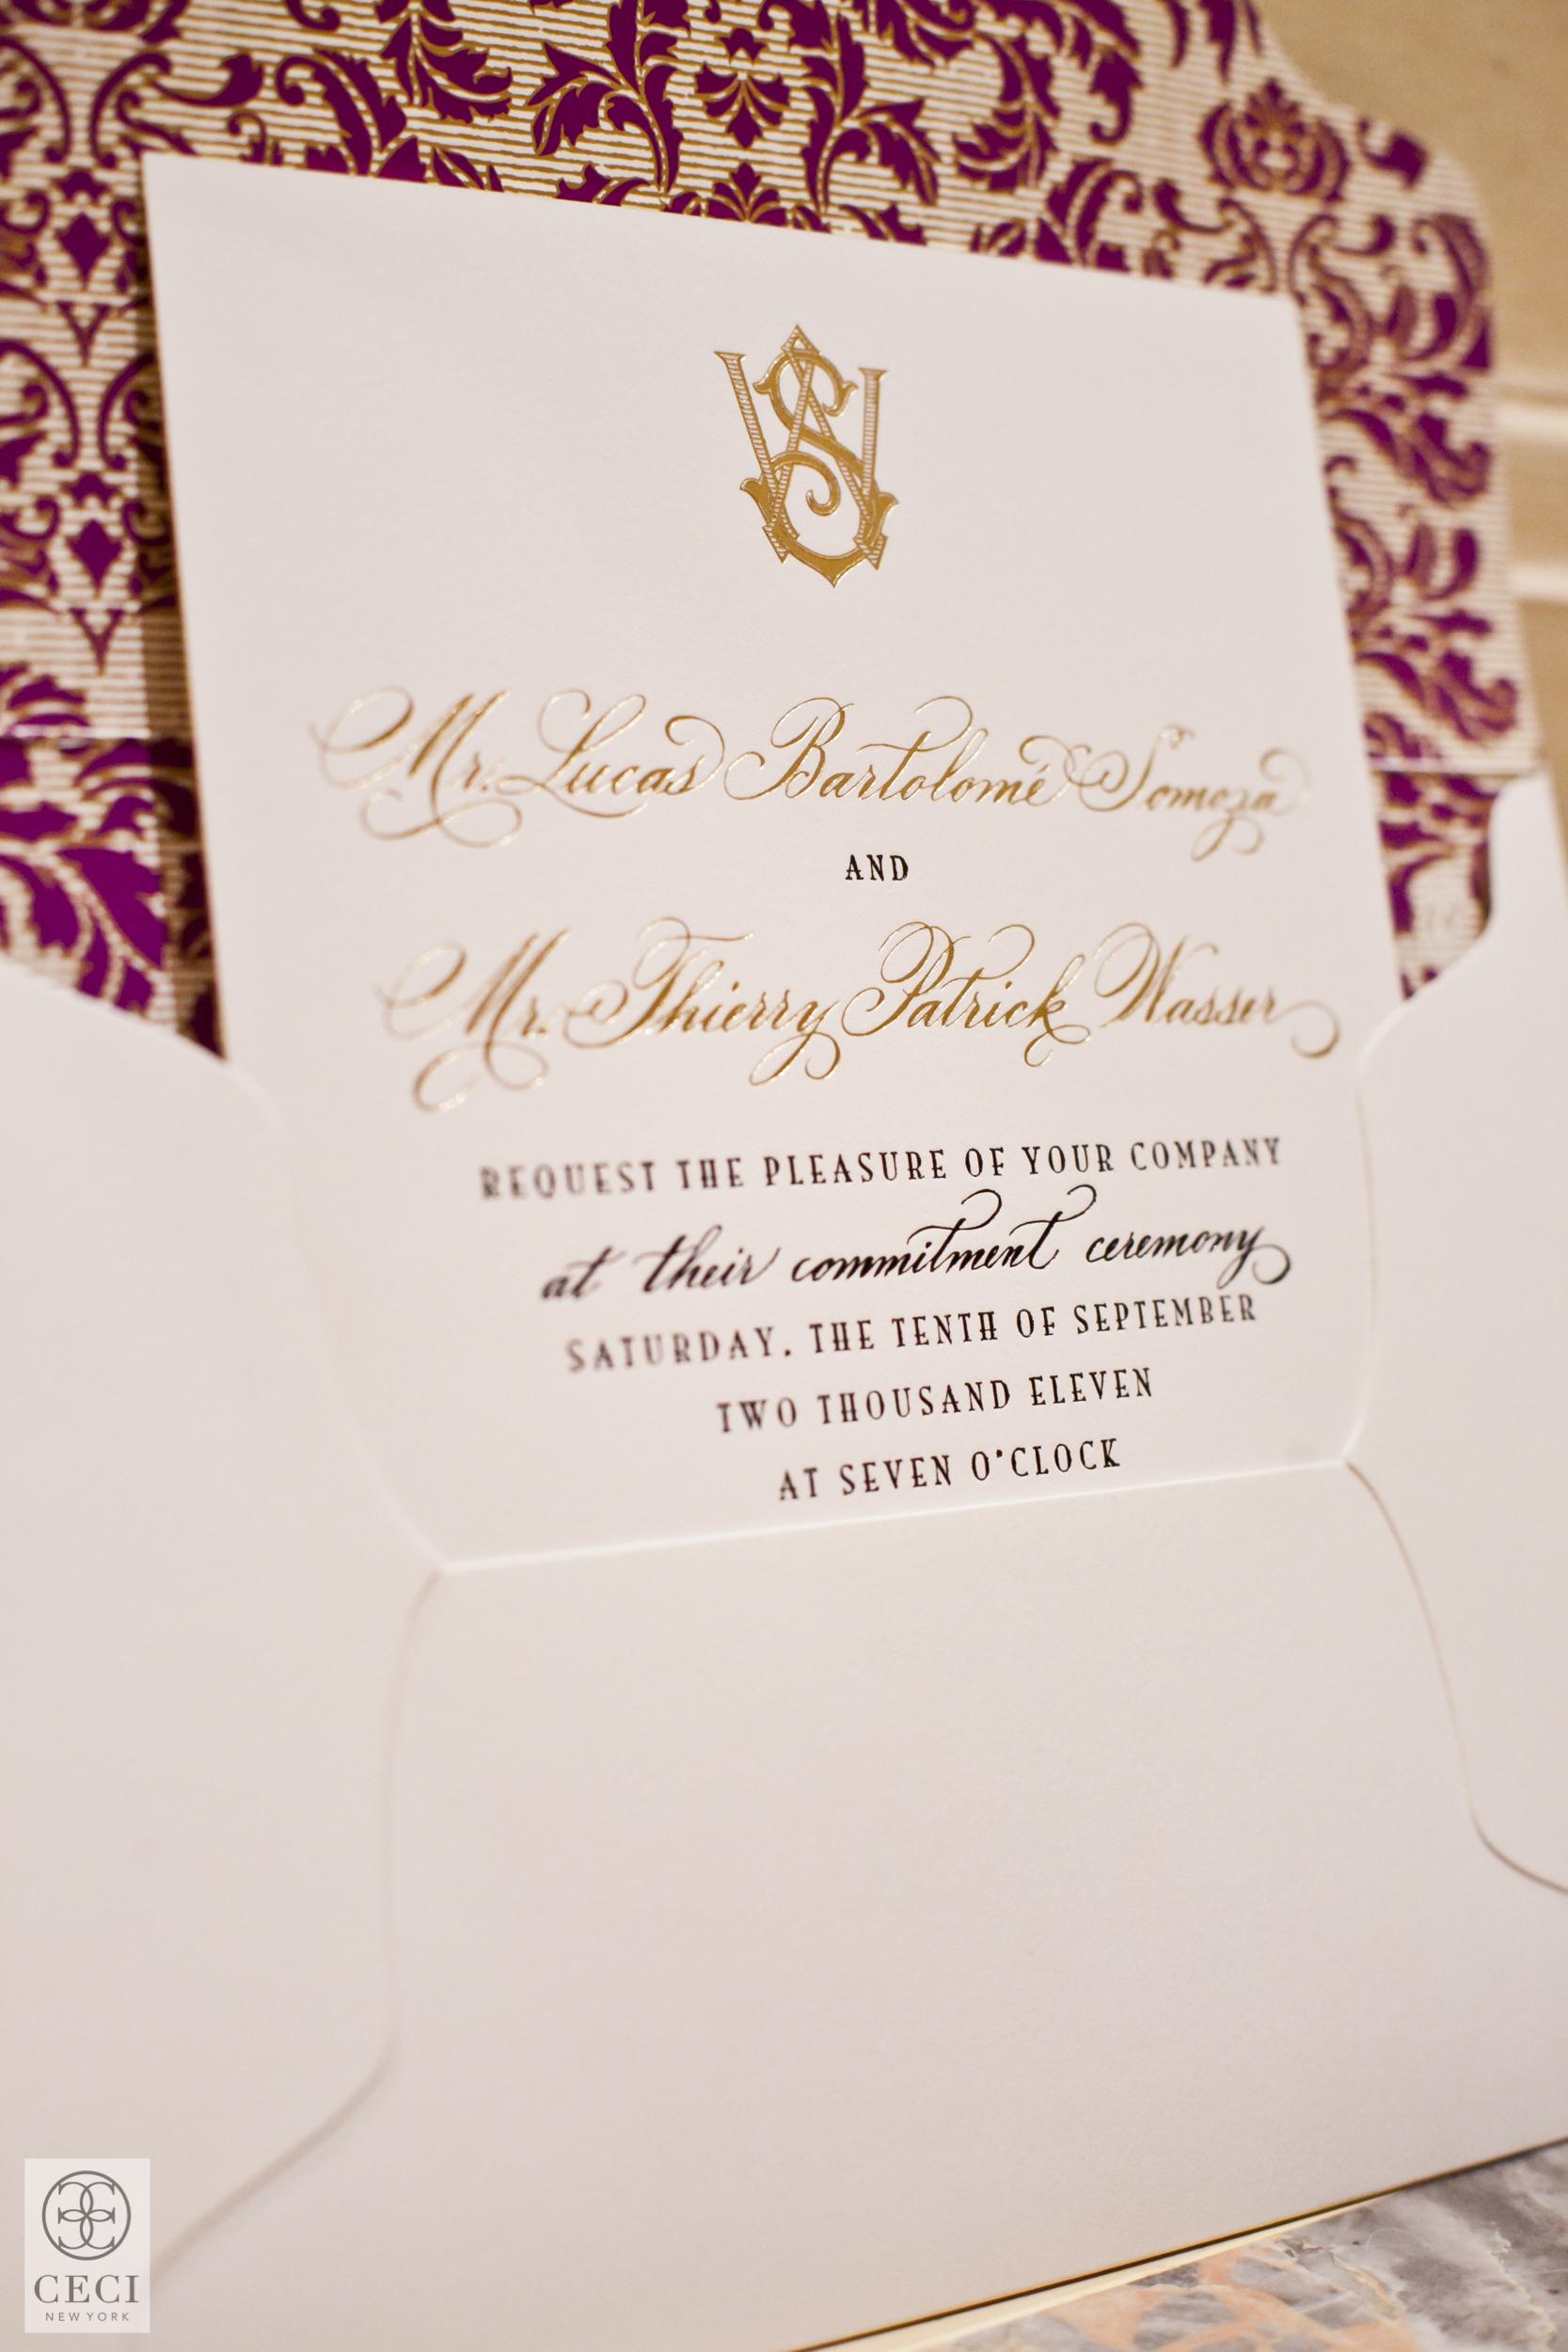 ceci_new_york_lucas_somoza_purple_regal_wediding_birthday_commitment_ceremony_invitation_logo_branding_perfume_gold_-11.jpg